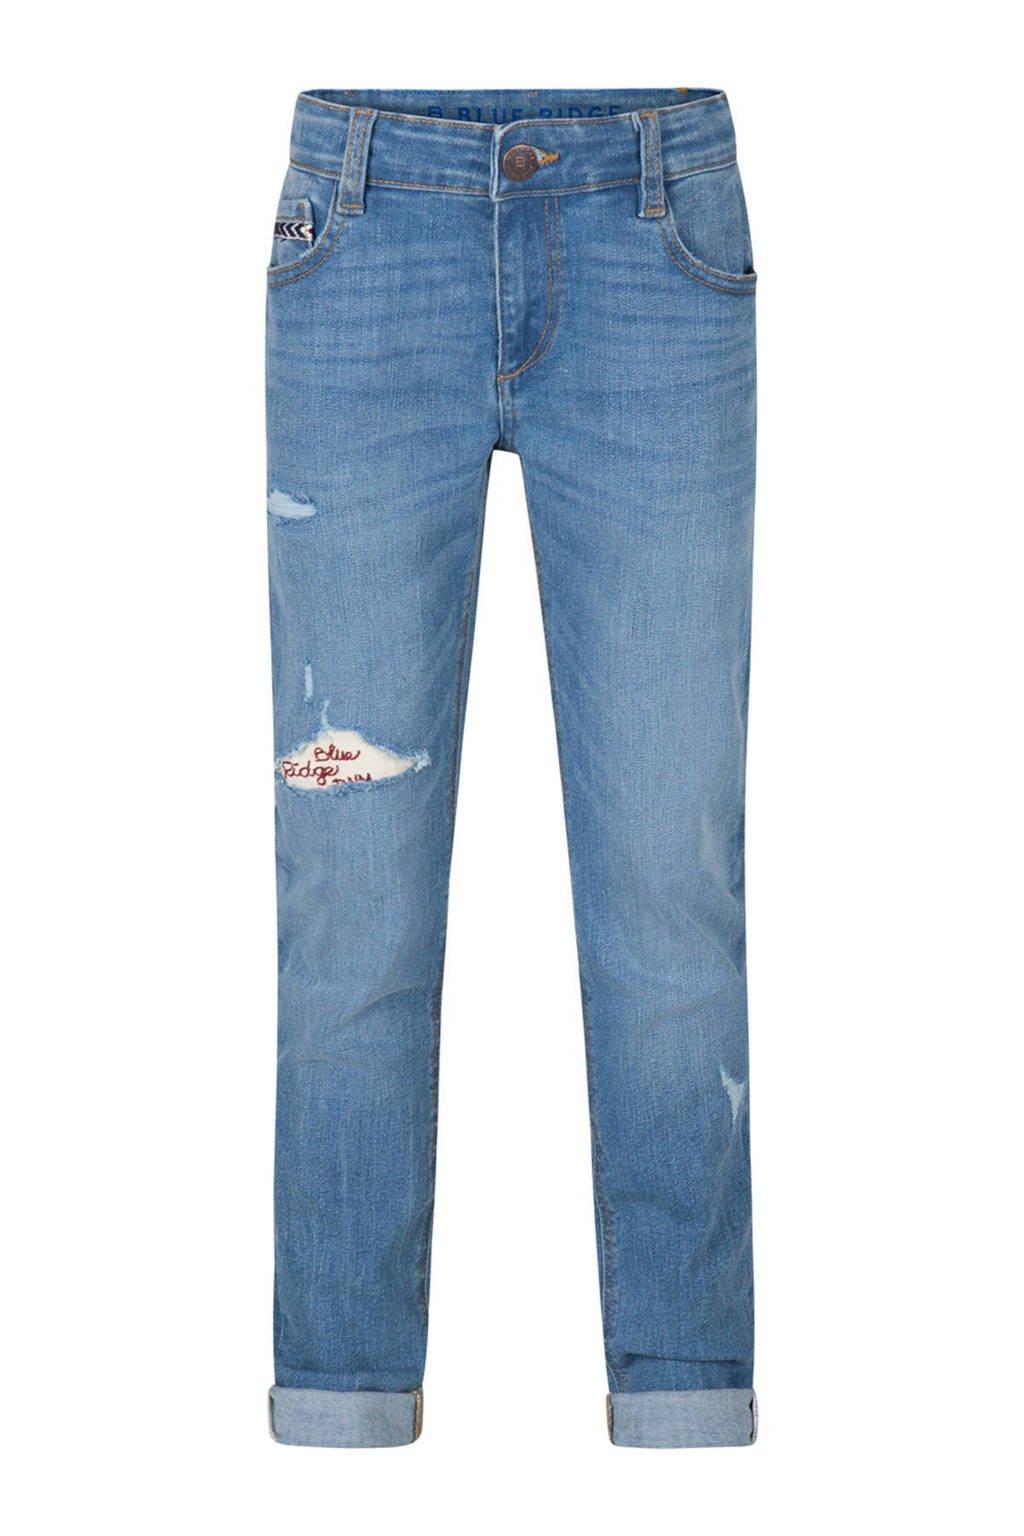 WE Fashion Blue Ridge slim fit jeans Karon met slijtage details, Denim blauw